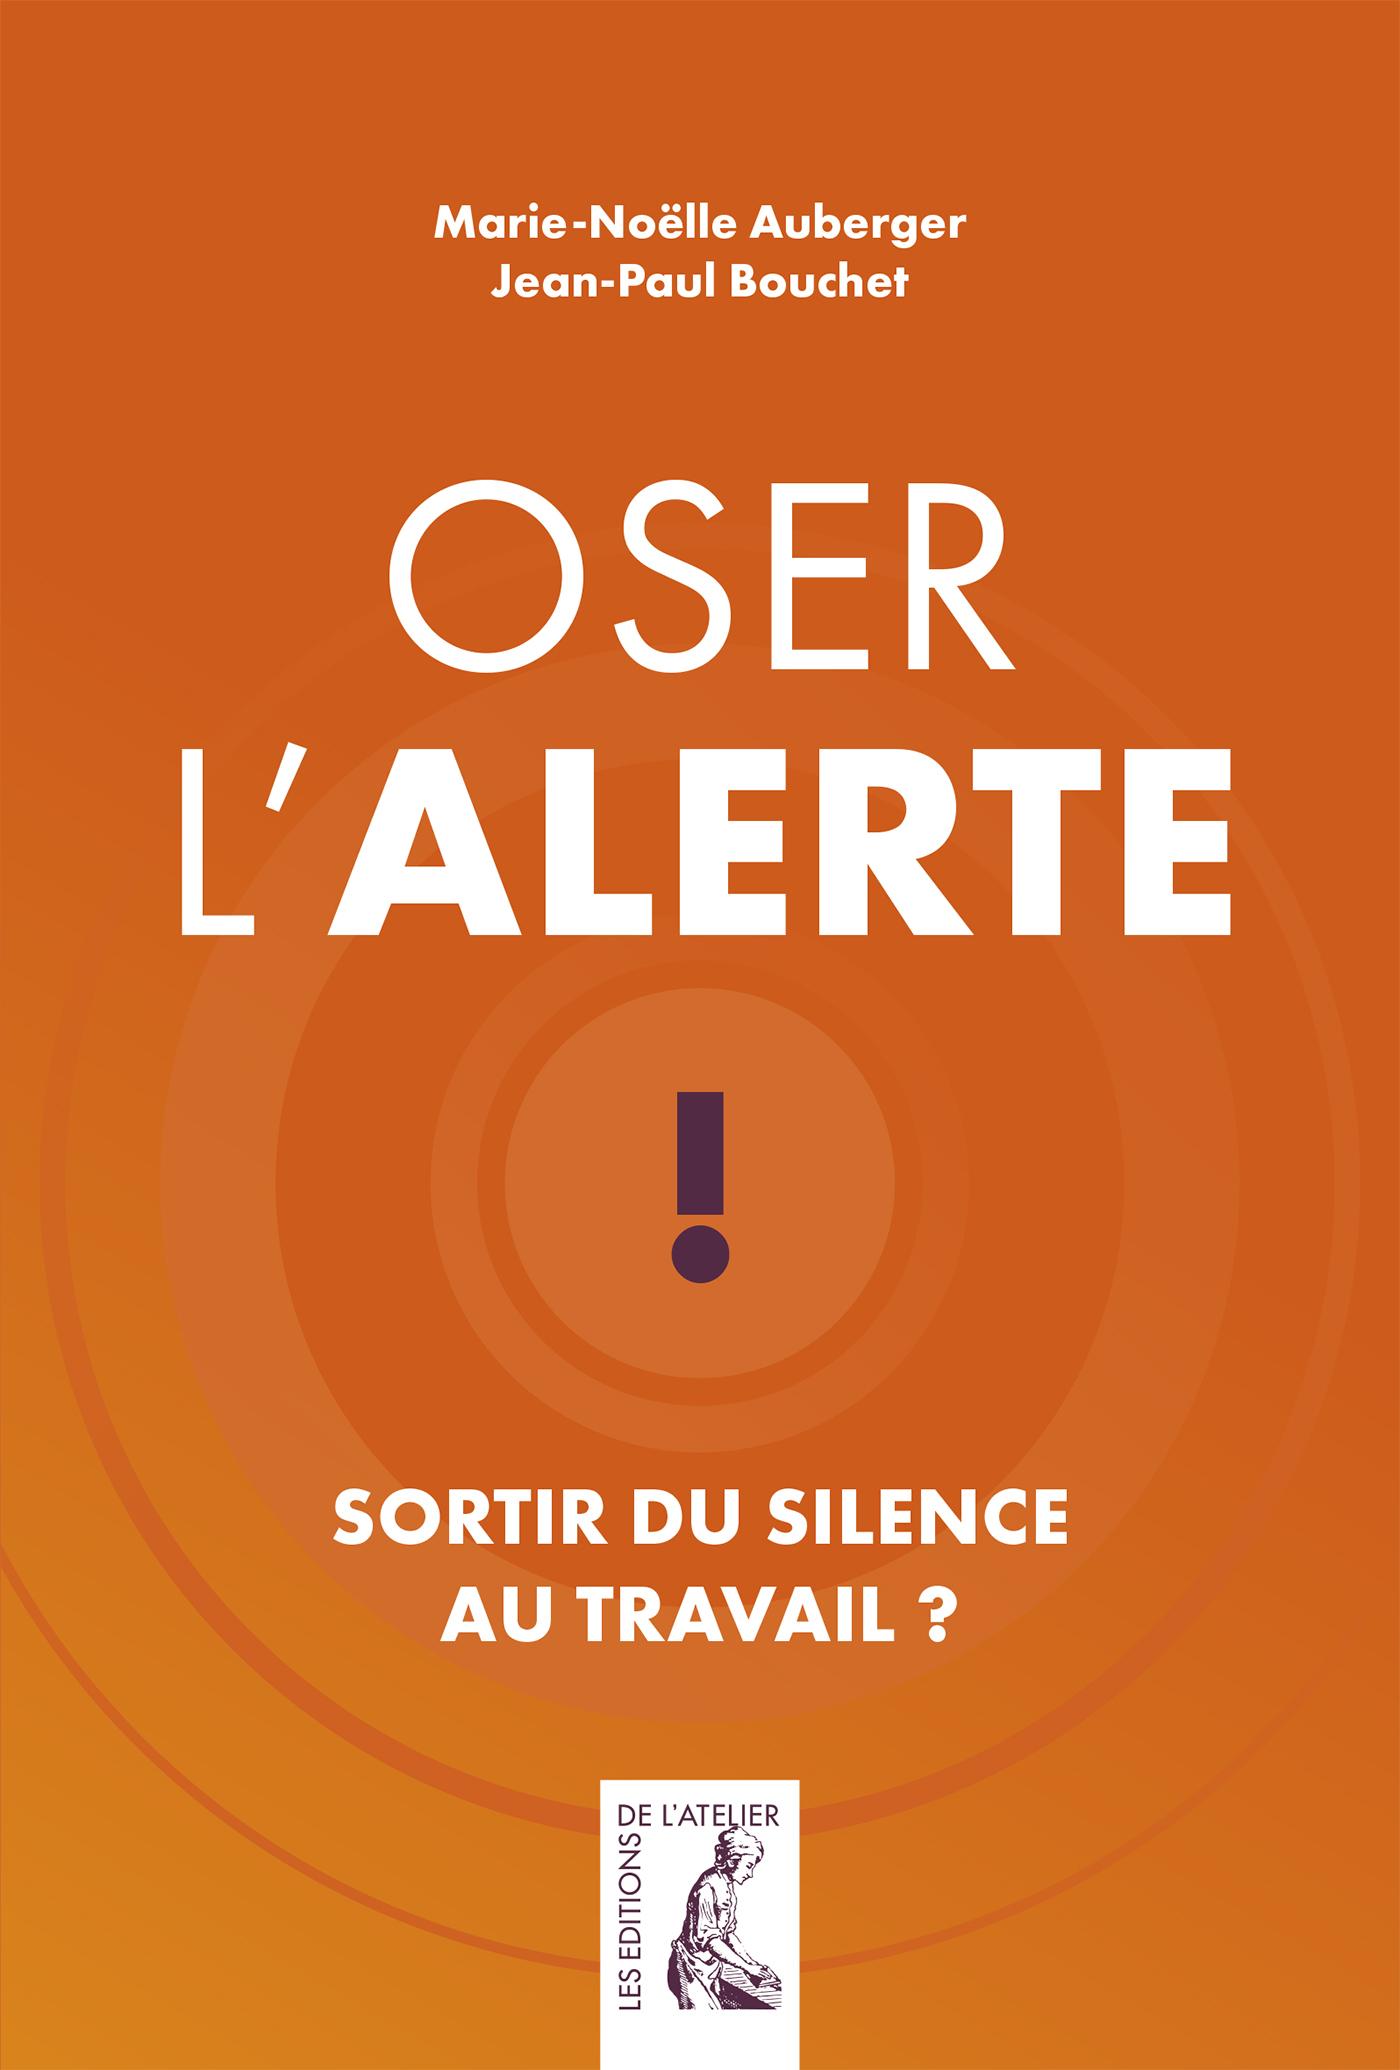 OSER L'ALERTE SORTIR DU SILENCE AU TRAVAIL